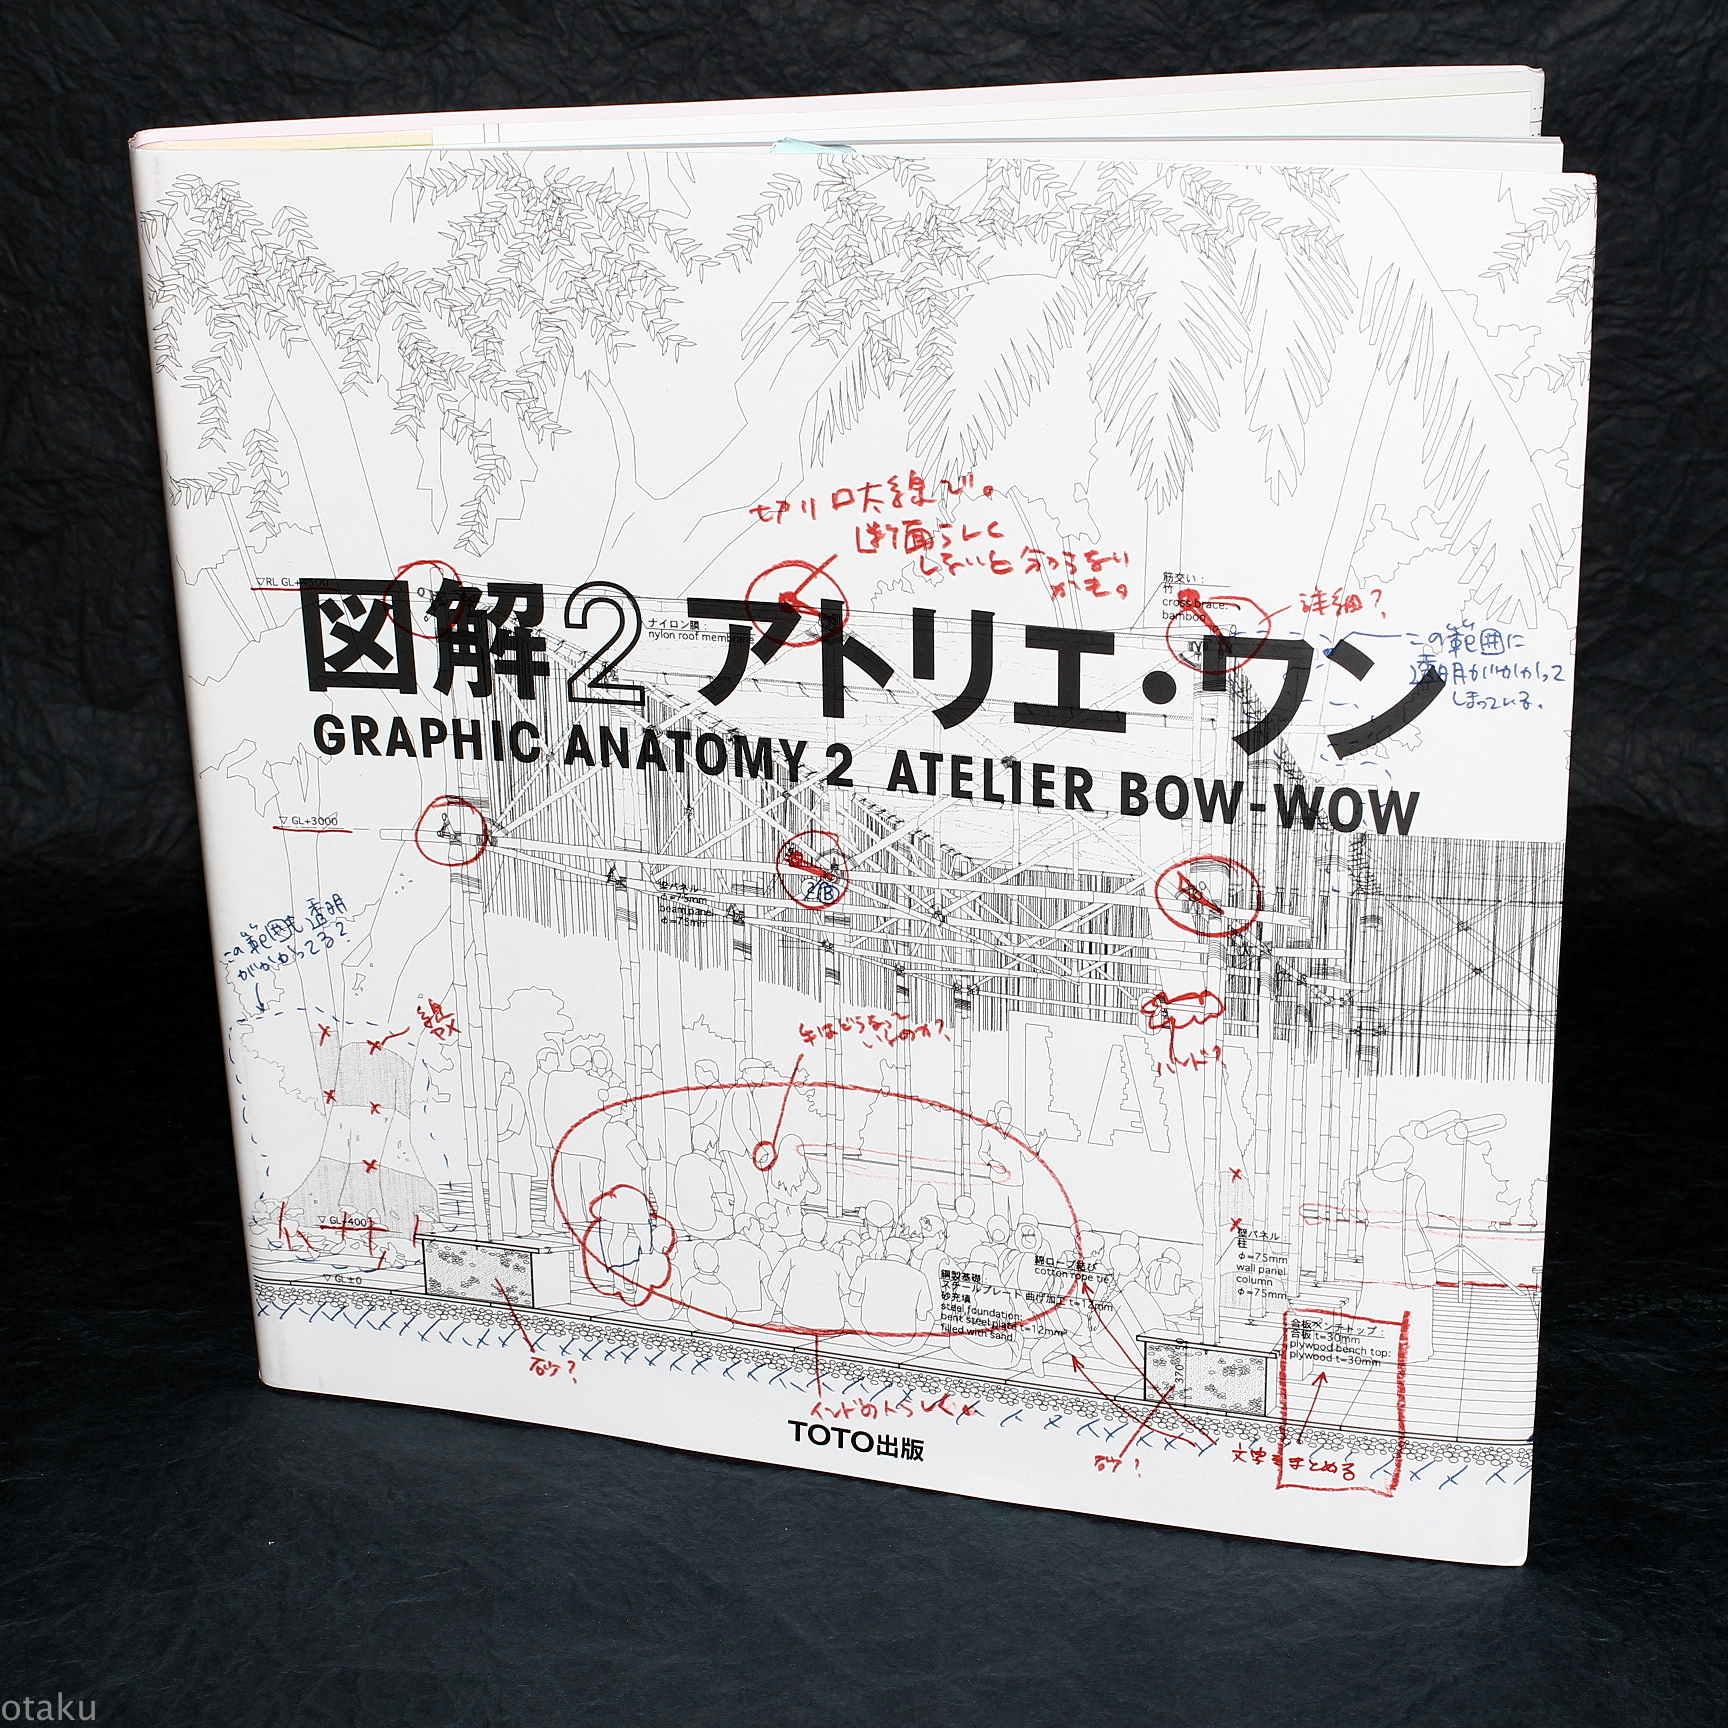 Graphic Anatomy 2 - Atelier Bow-Wow - Architecture Book   otaku.com